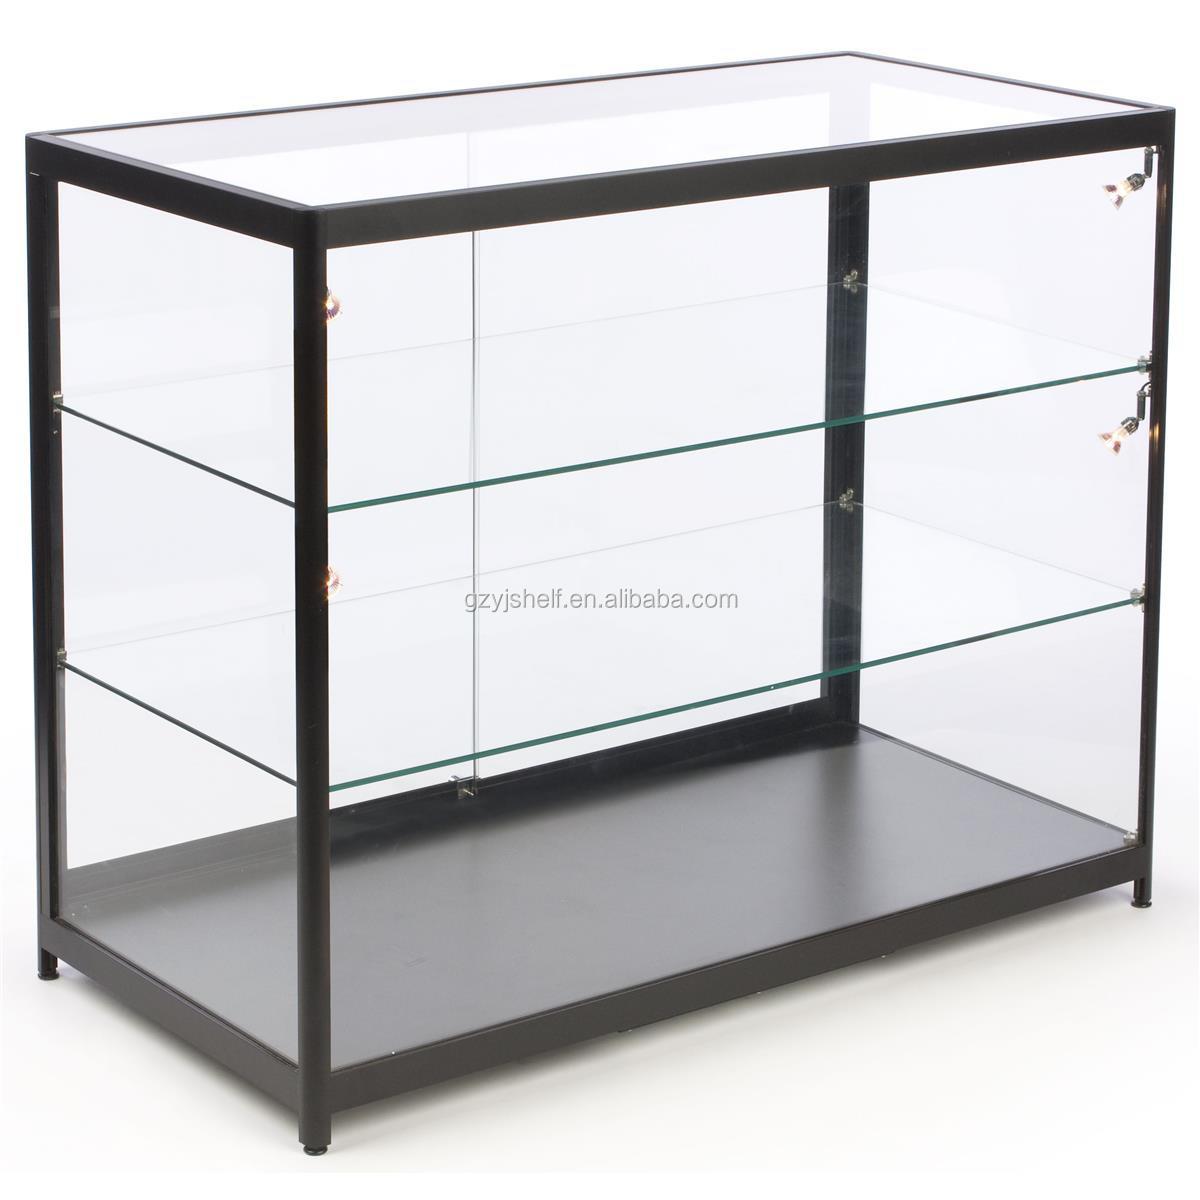 glass sliding door display stand glass shelf dvd wall mount mdf